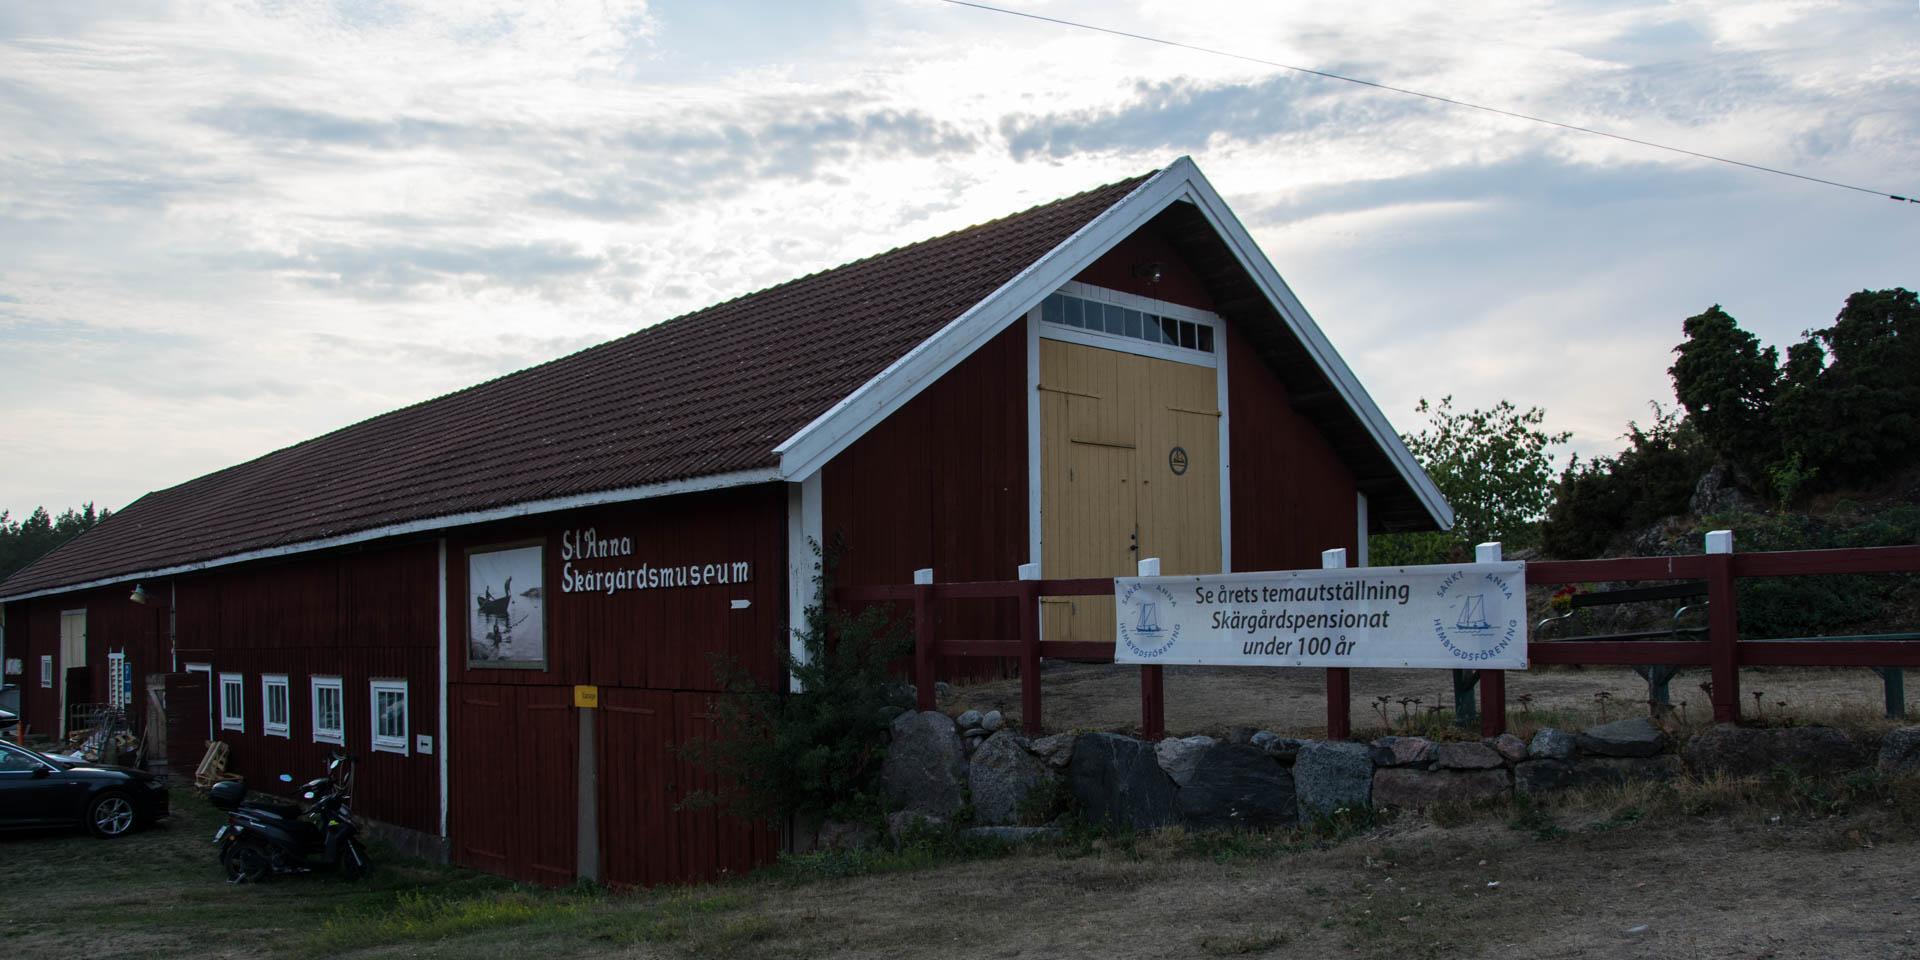 S:t Anna Skärgårdsmuseum 2018